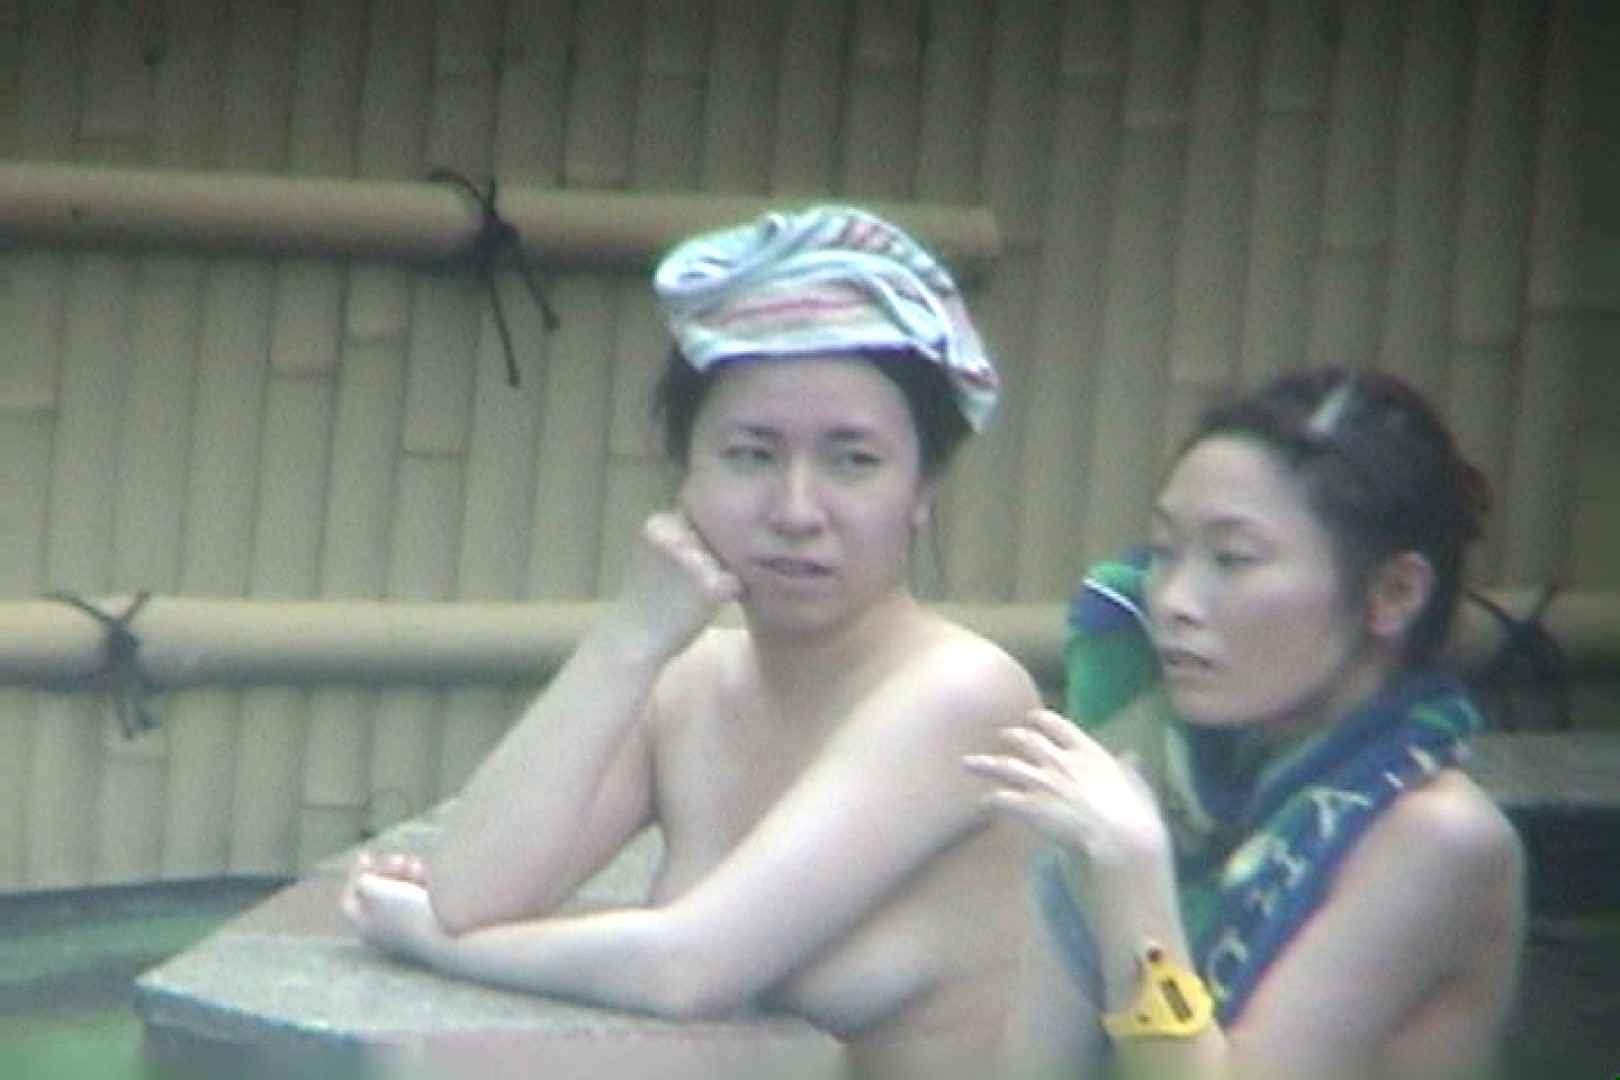 Aquaな露天風呂Vol.106 盗撮シリーズ | 露天風呂編  86PIX 27